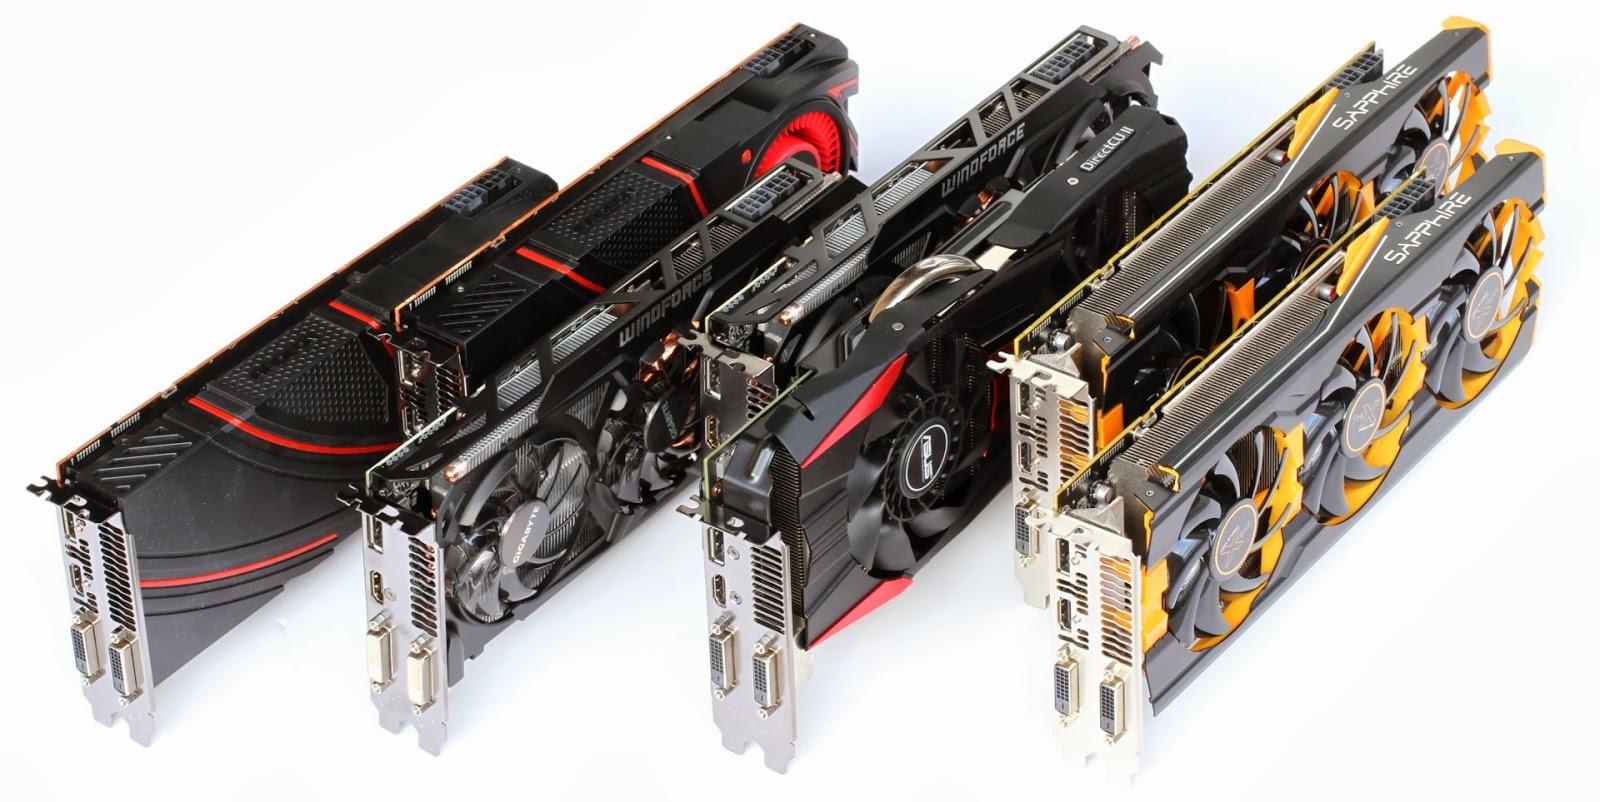 la-centrale-du-hardware-test-amd-radeon-r9-290-290x-asus-dcu-directcu-sapphire-tri-x-gigabyte-windforce